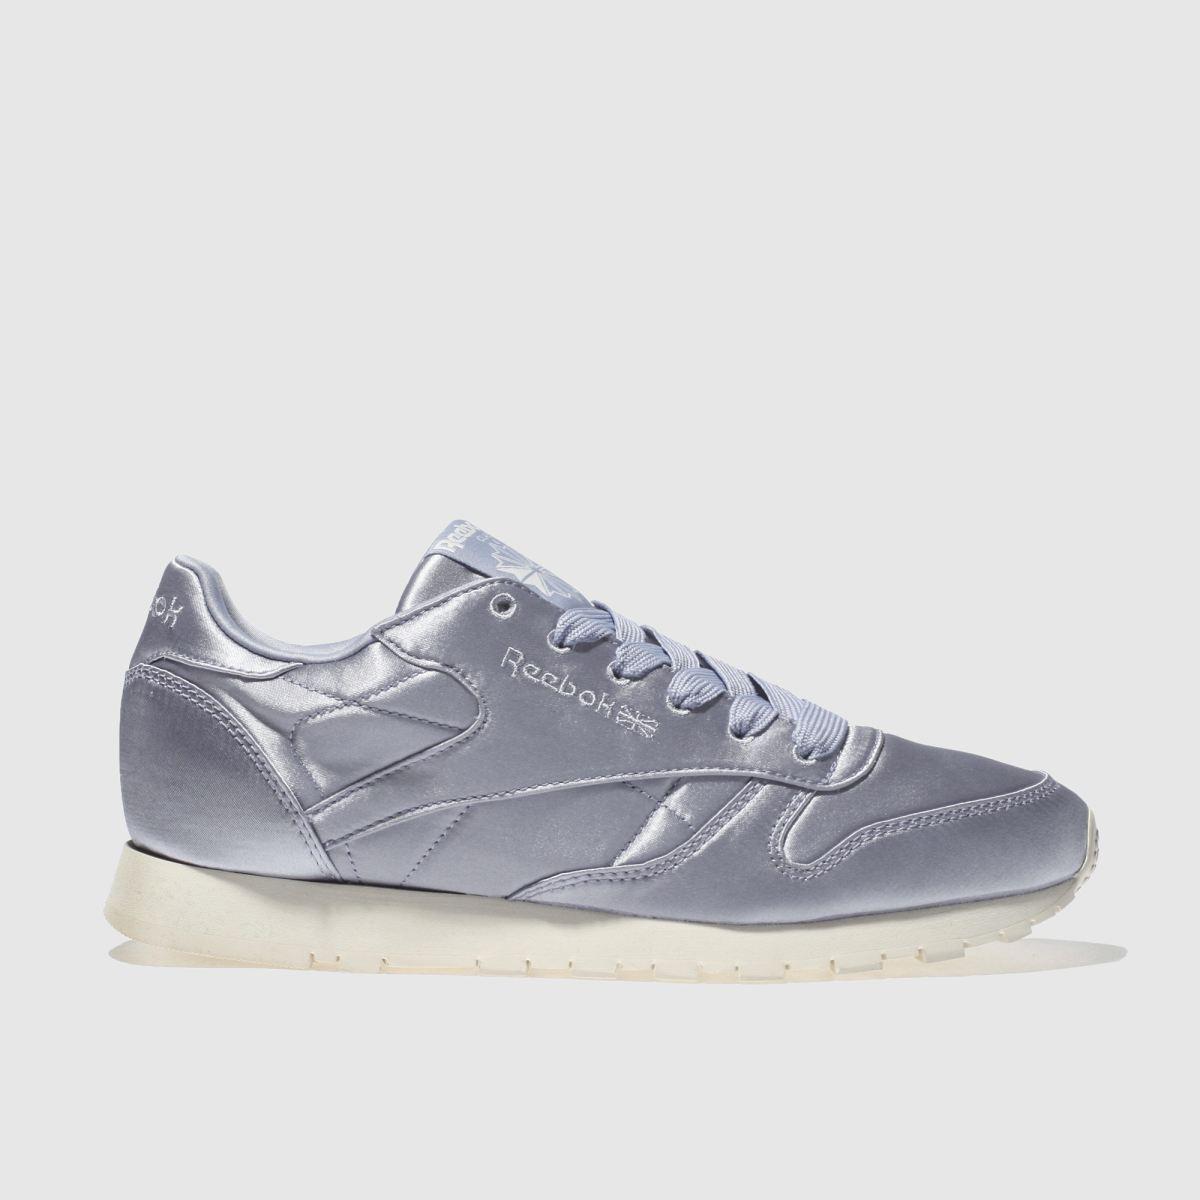 Reebok Light Blue Classic Leather Satin Trainers